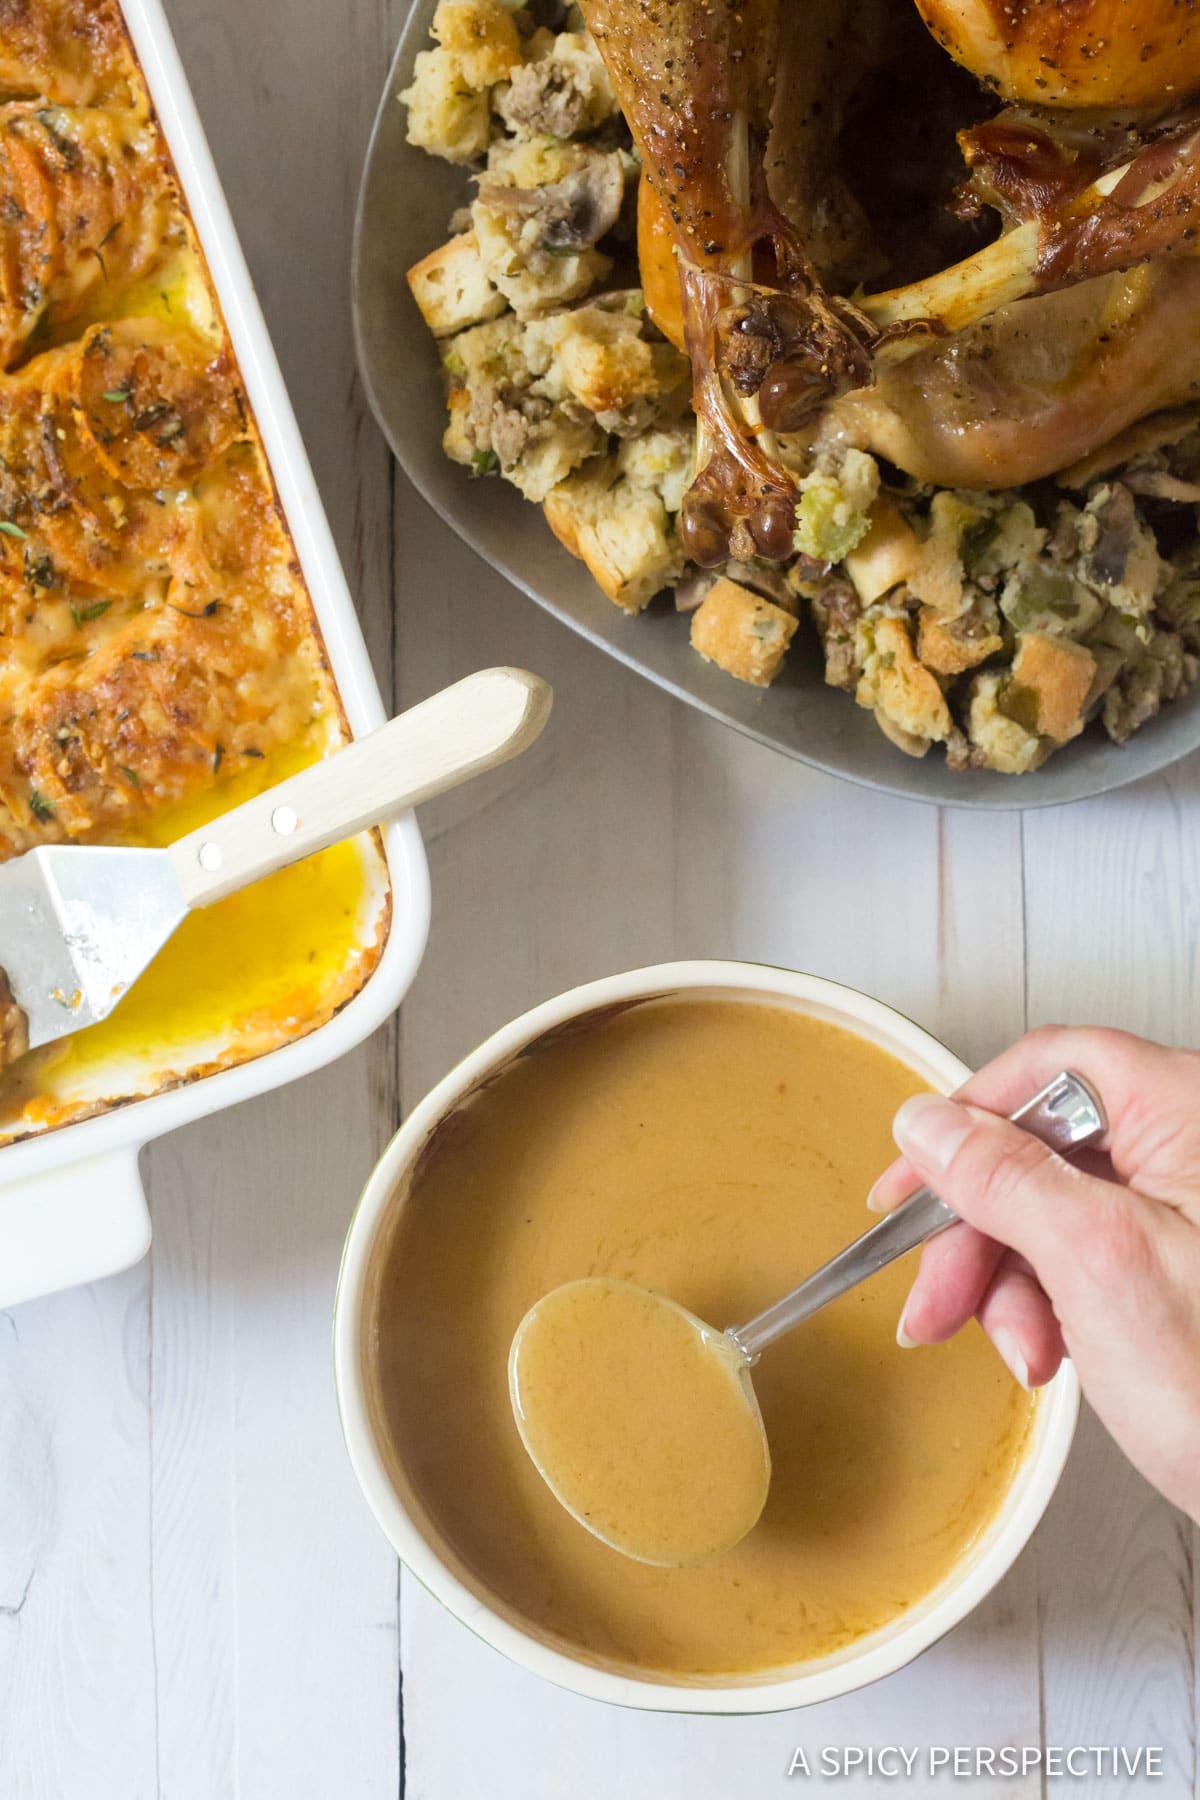 How To Make Turkey Gravy (Homemade Turkey Gravy Recipe) #ASpicyPerspective #Thanksgiving